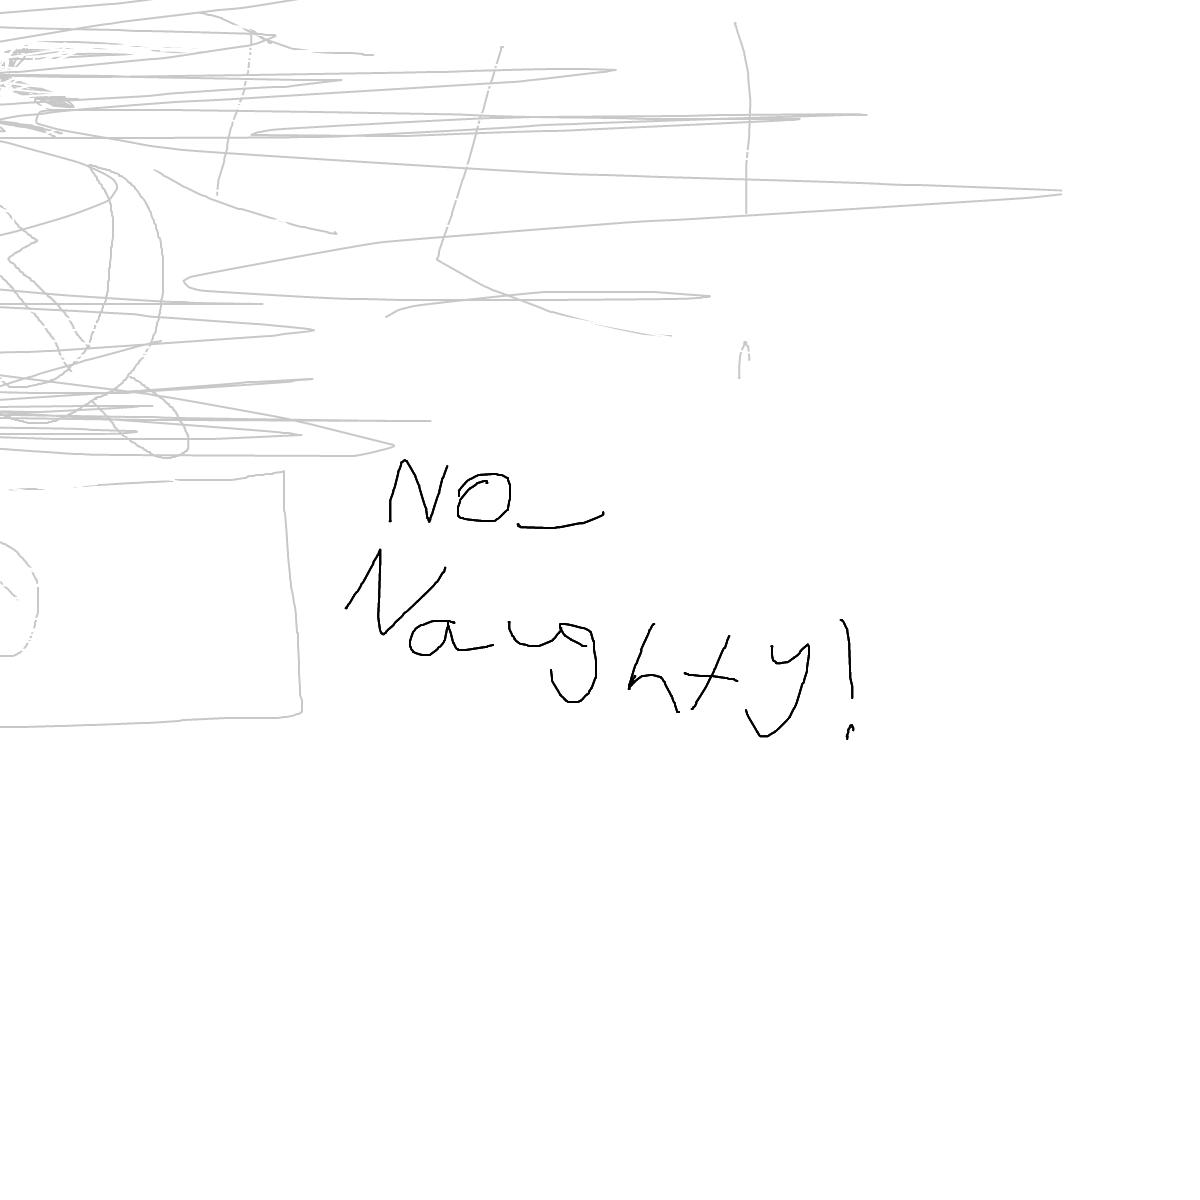 BAAAM drawing#23335 lat:55.7520866394043000lng: 37.6203117370605500